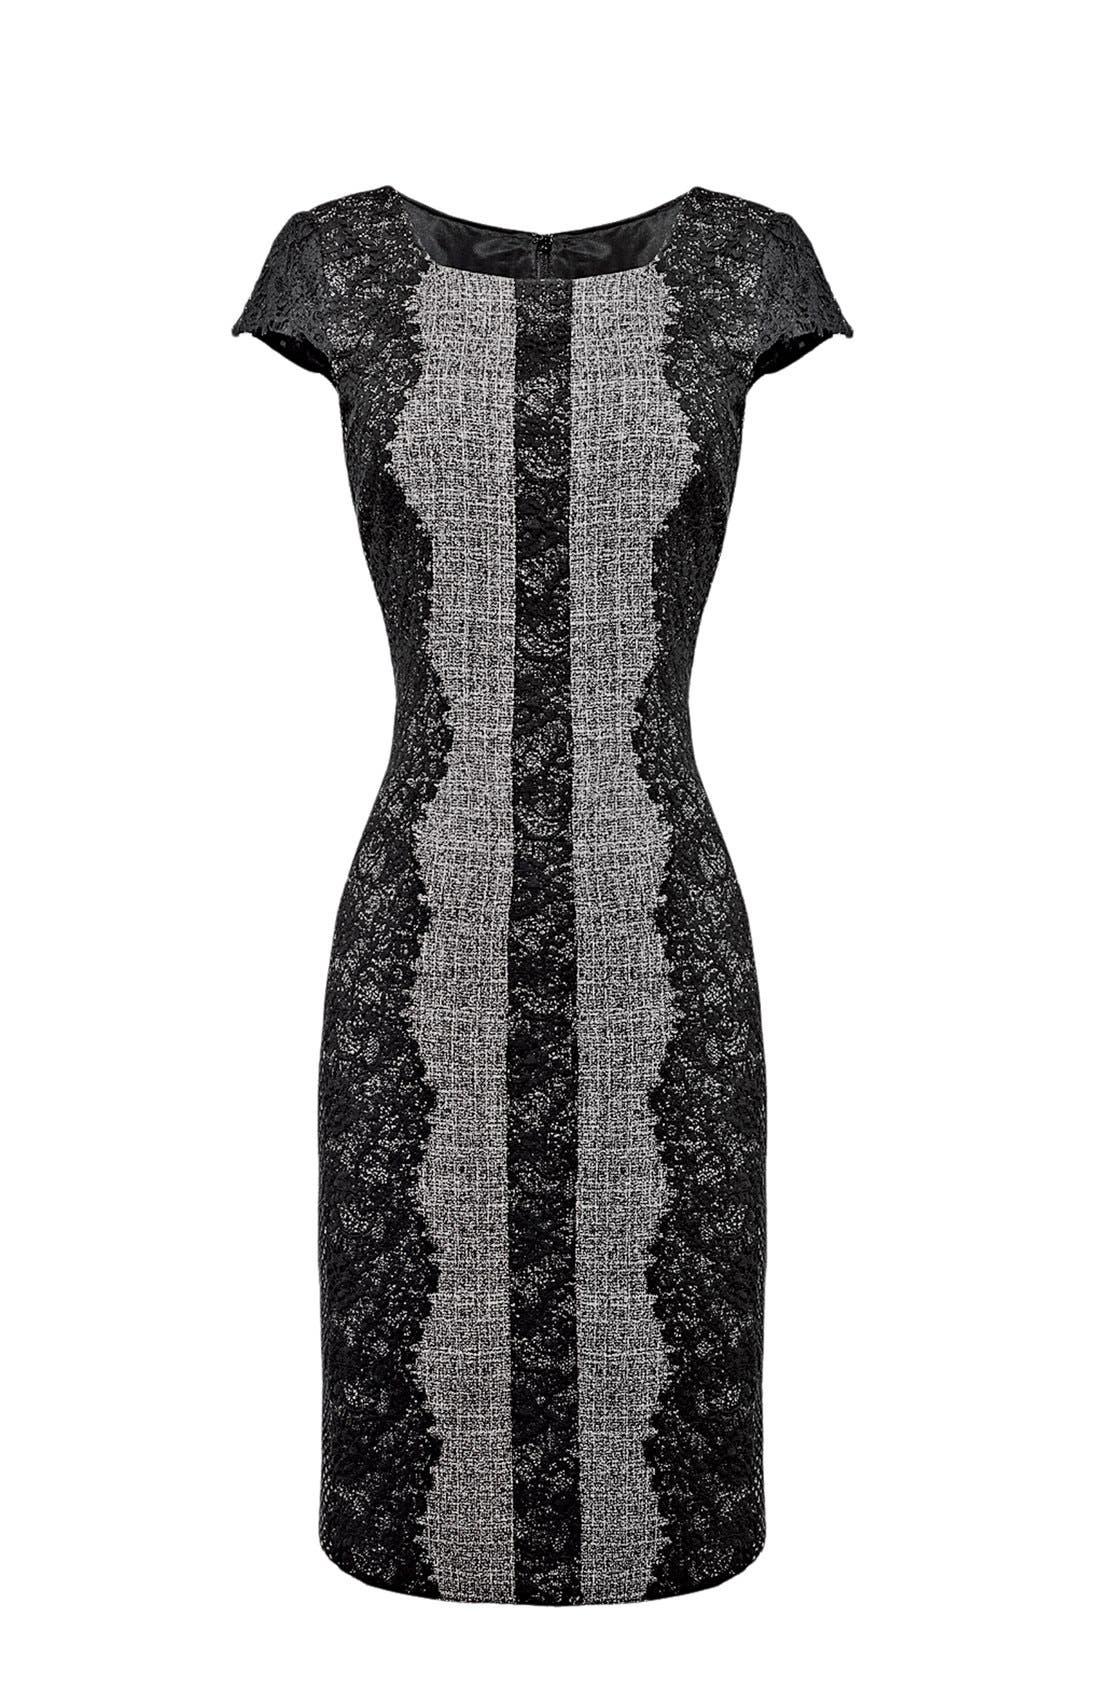 Lace Trim Tweed Sheath Dress,                             Alternate thumbnail 7, color,                             020